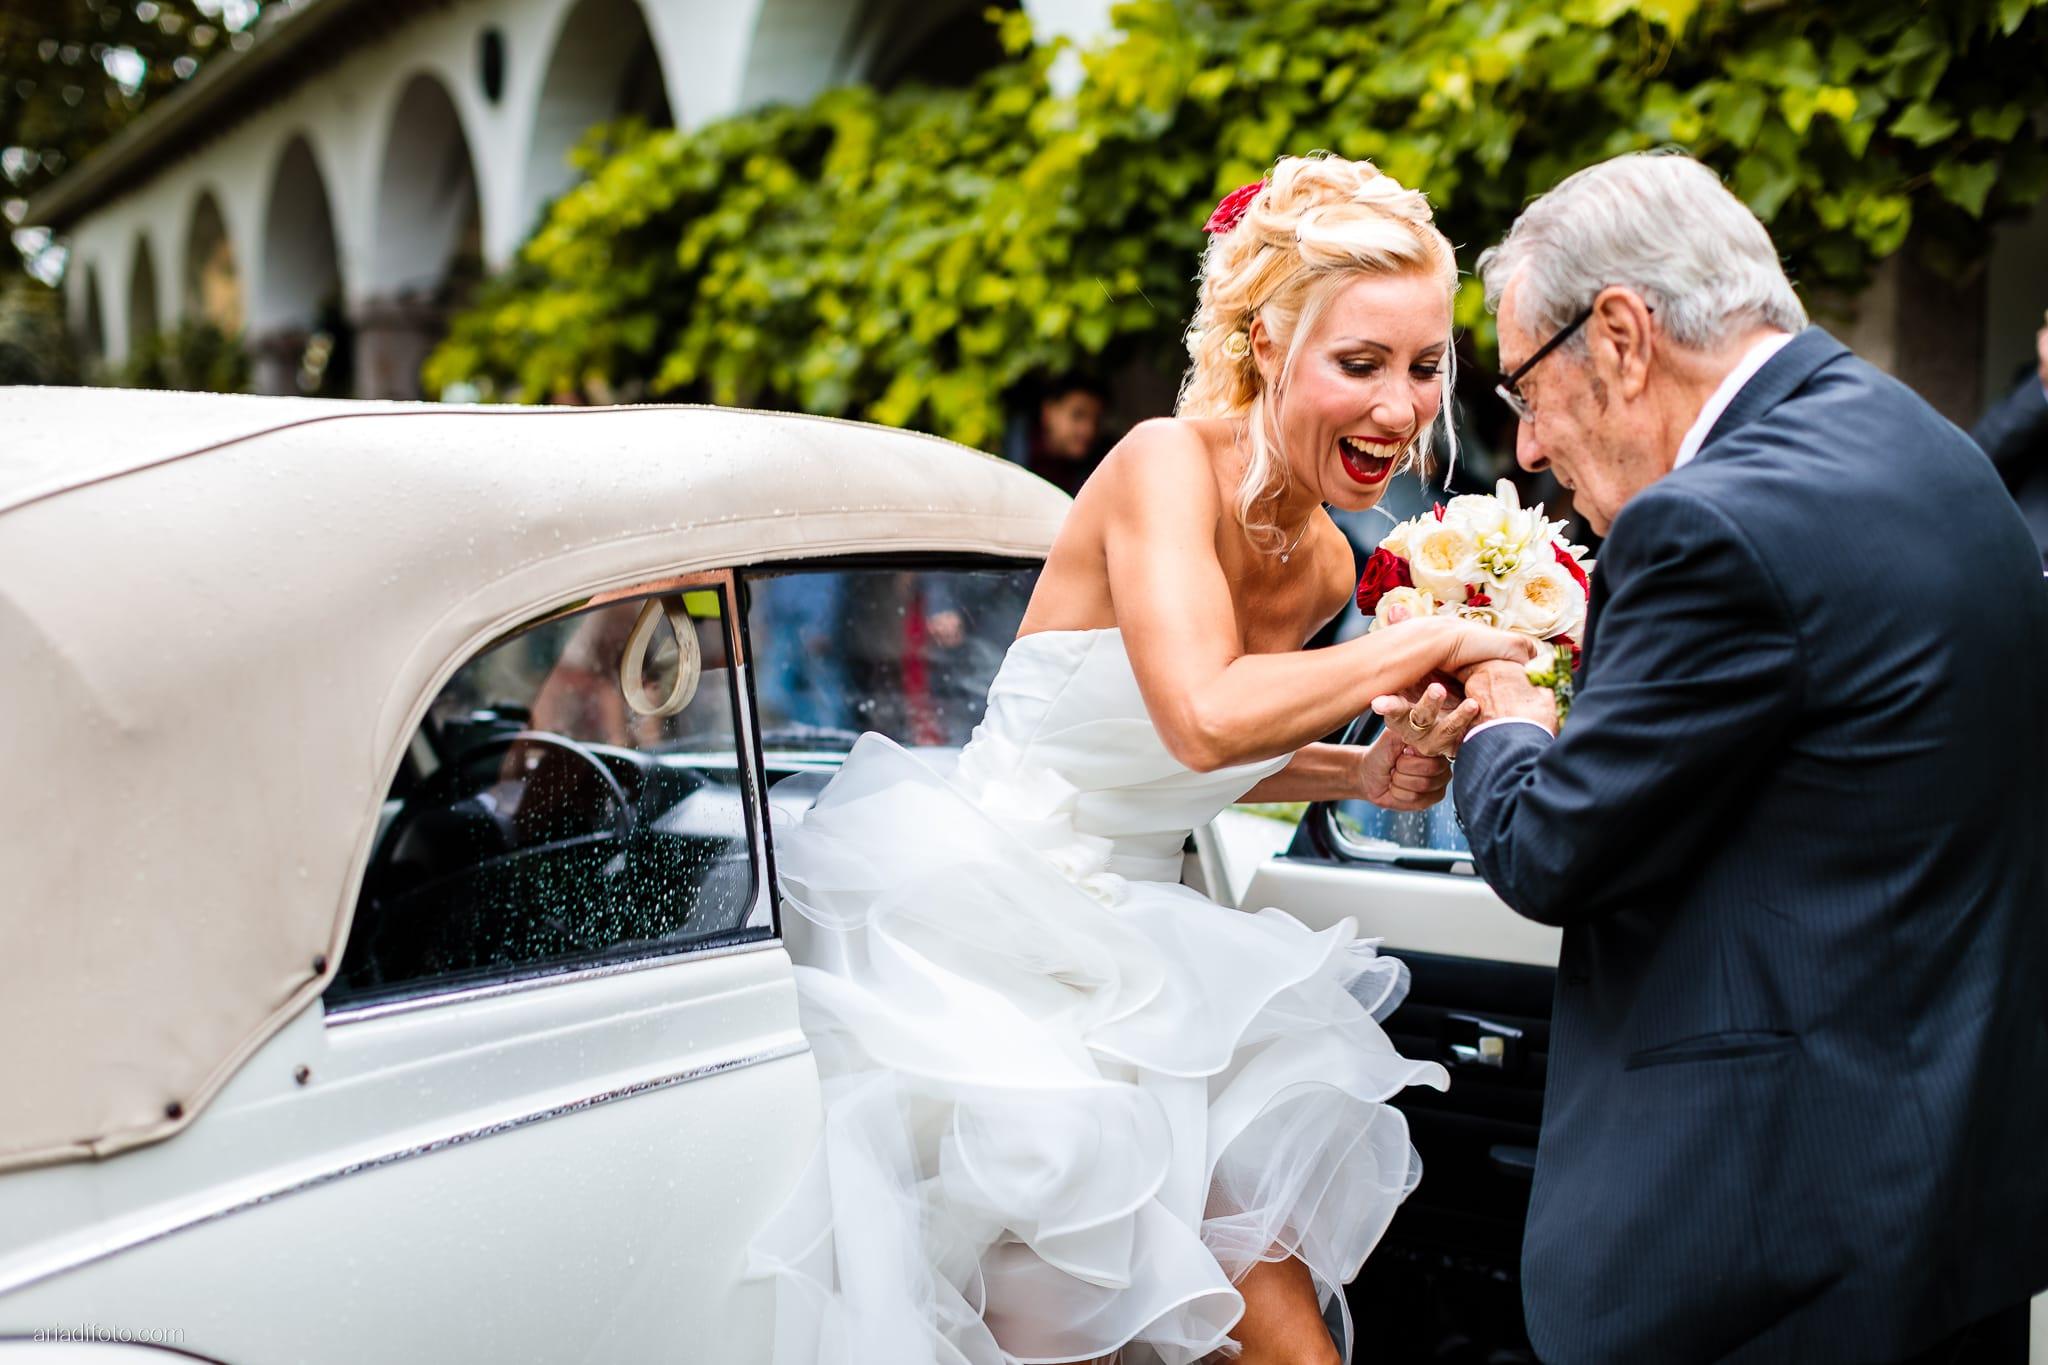 Francesca Davide Matrimonio Destination Wedding Castello Zemono Valle Vipacco Slovenia cerimonia civile arrivo ingresso sposa